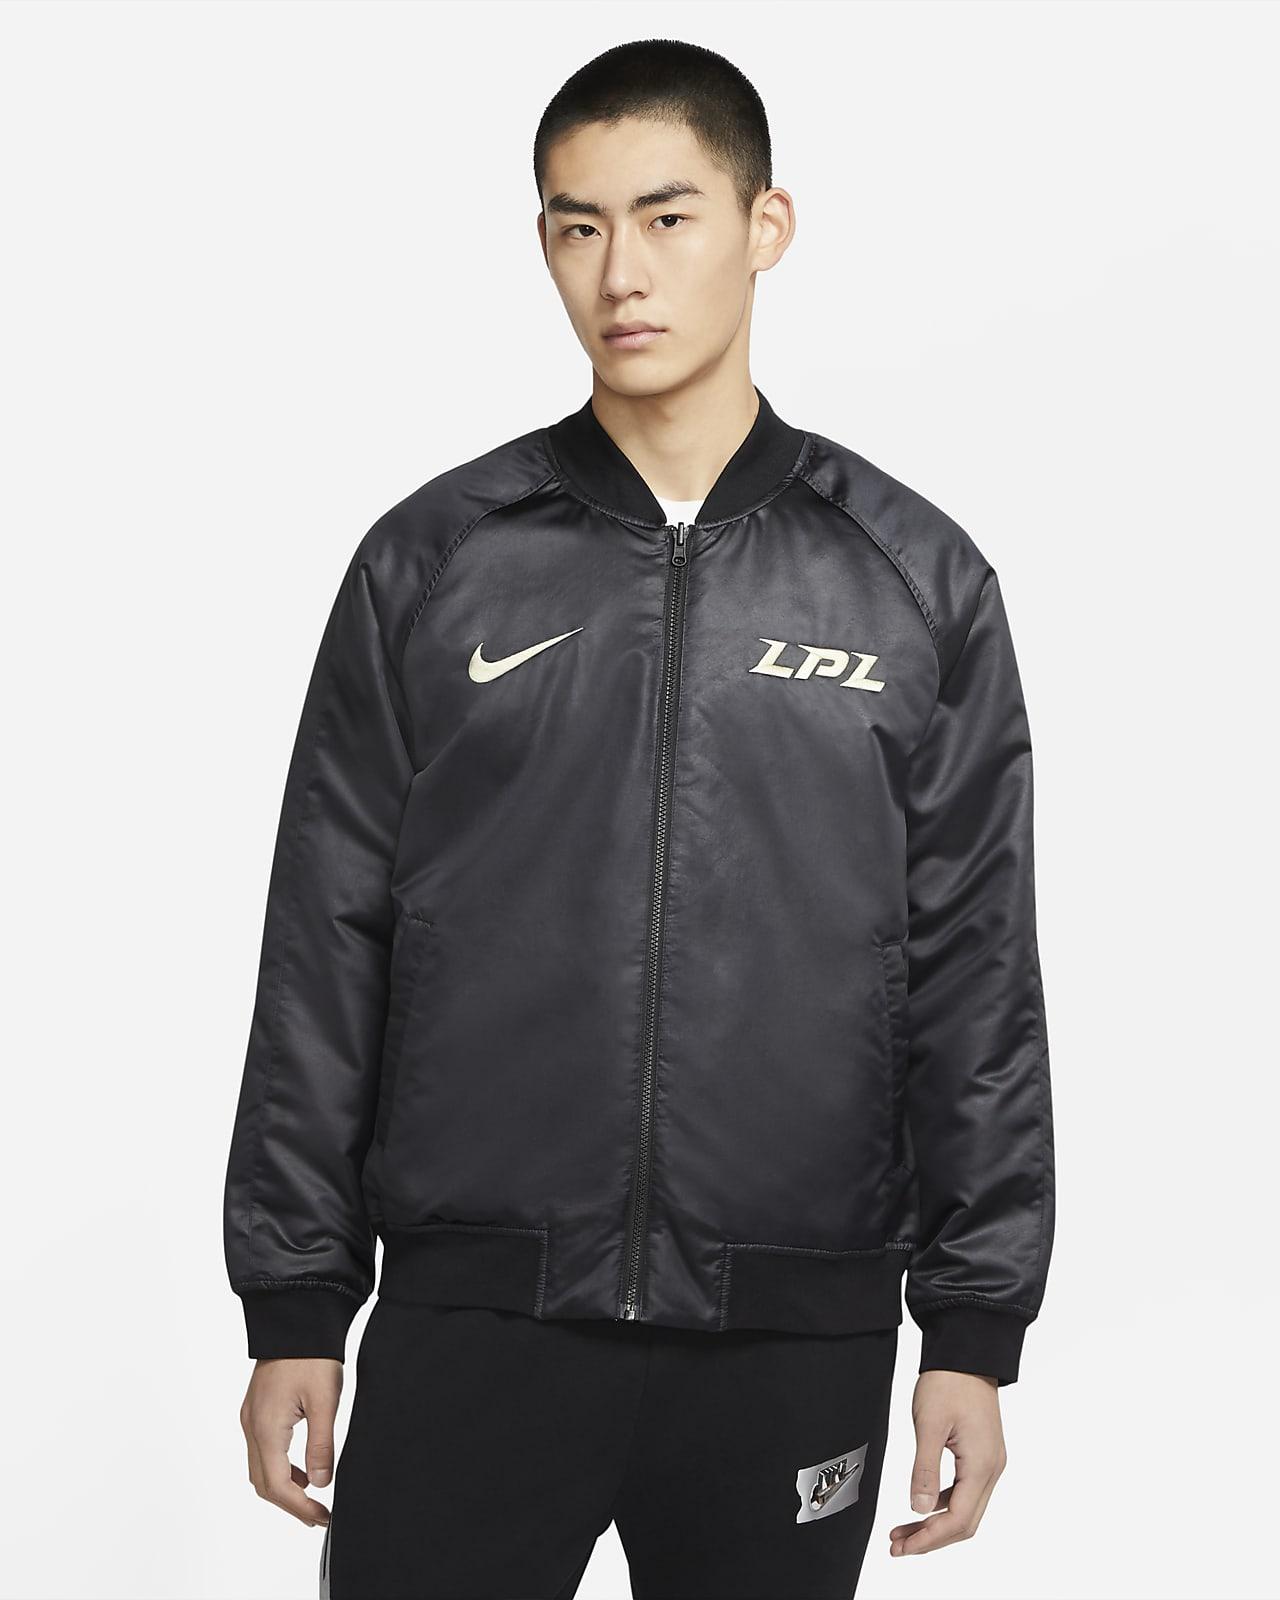 Nike x LPL 男子梭织夹克